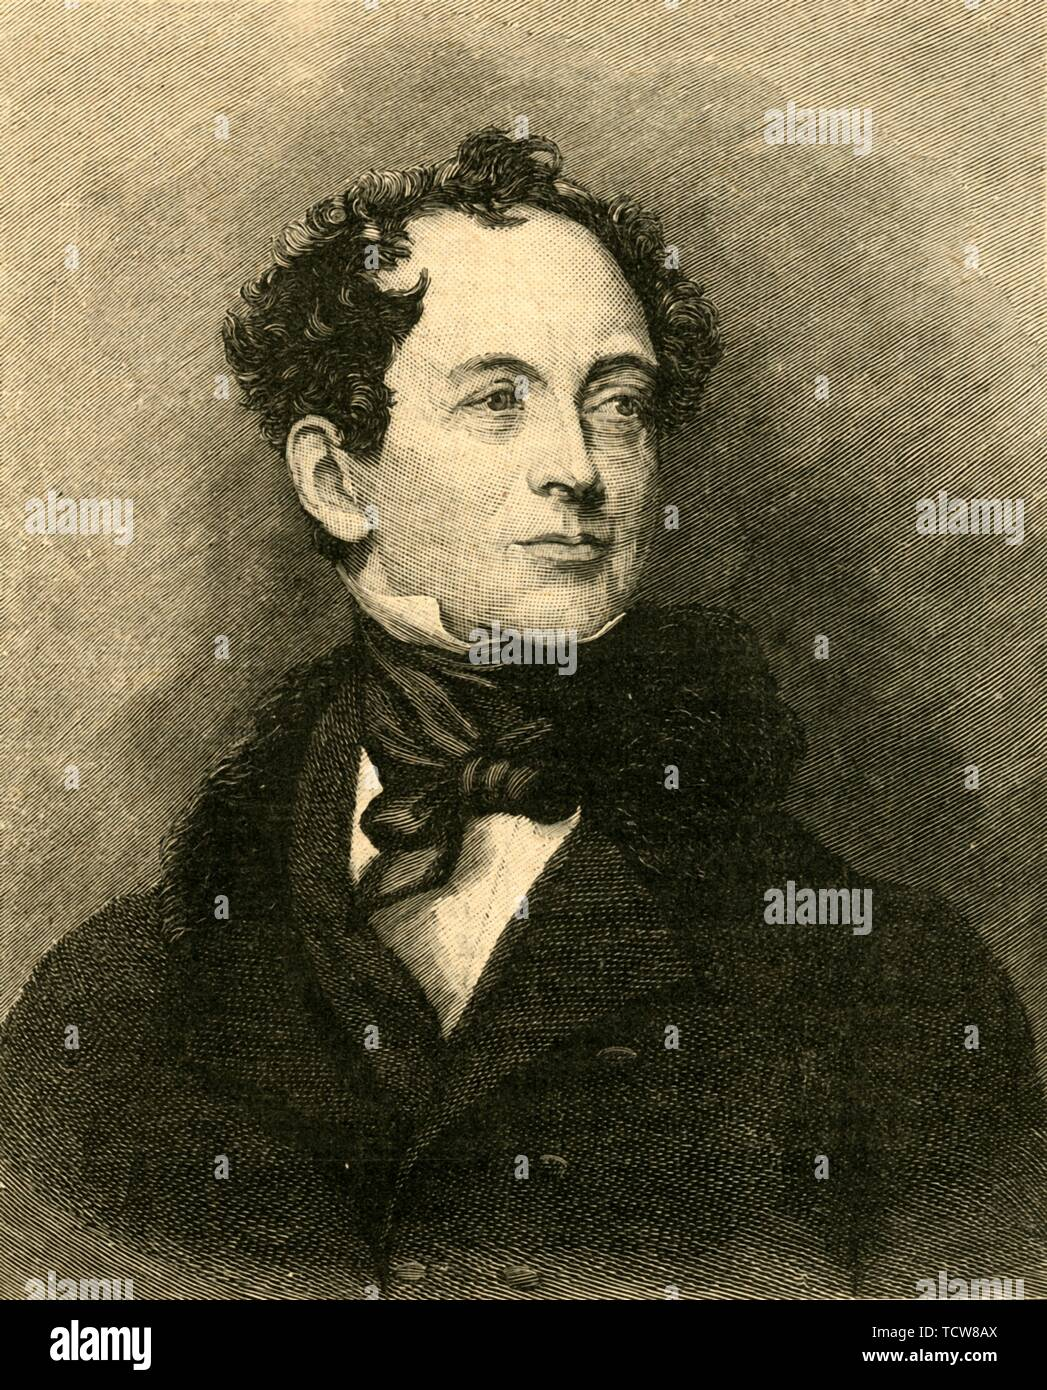 Thomas Moore, Irish poet and biographer of Lord Byron, c1829 (c1890). Creator: Unknown. - Stock Image